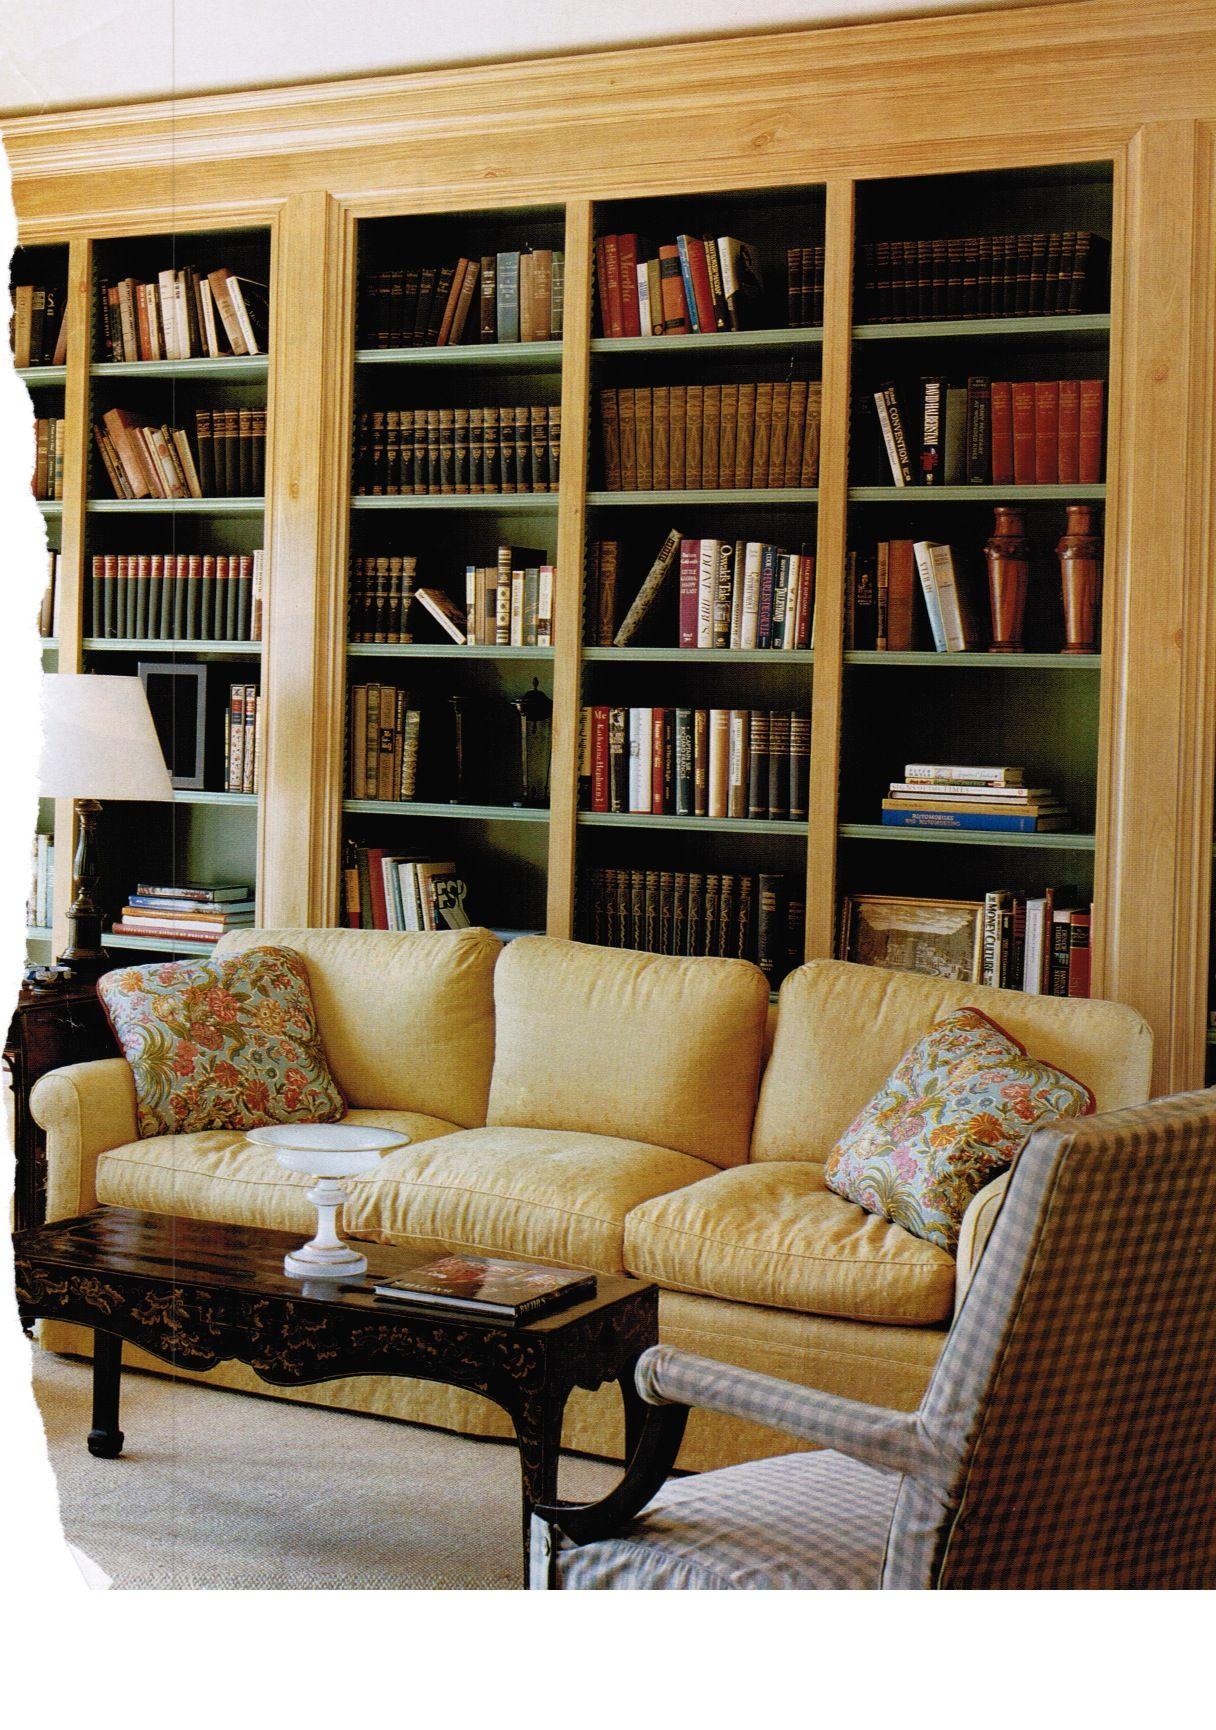 Best Built Ins Behind Sofa Home Decor Inspiration Decor 640 x 480